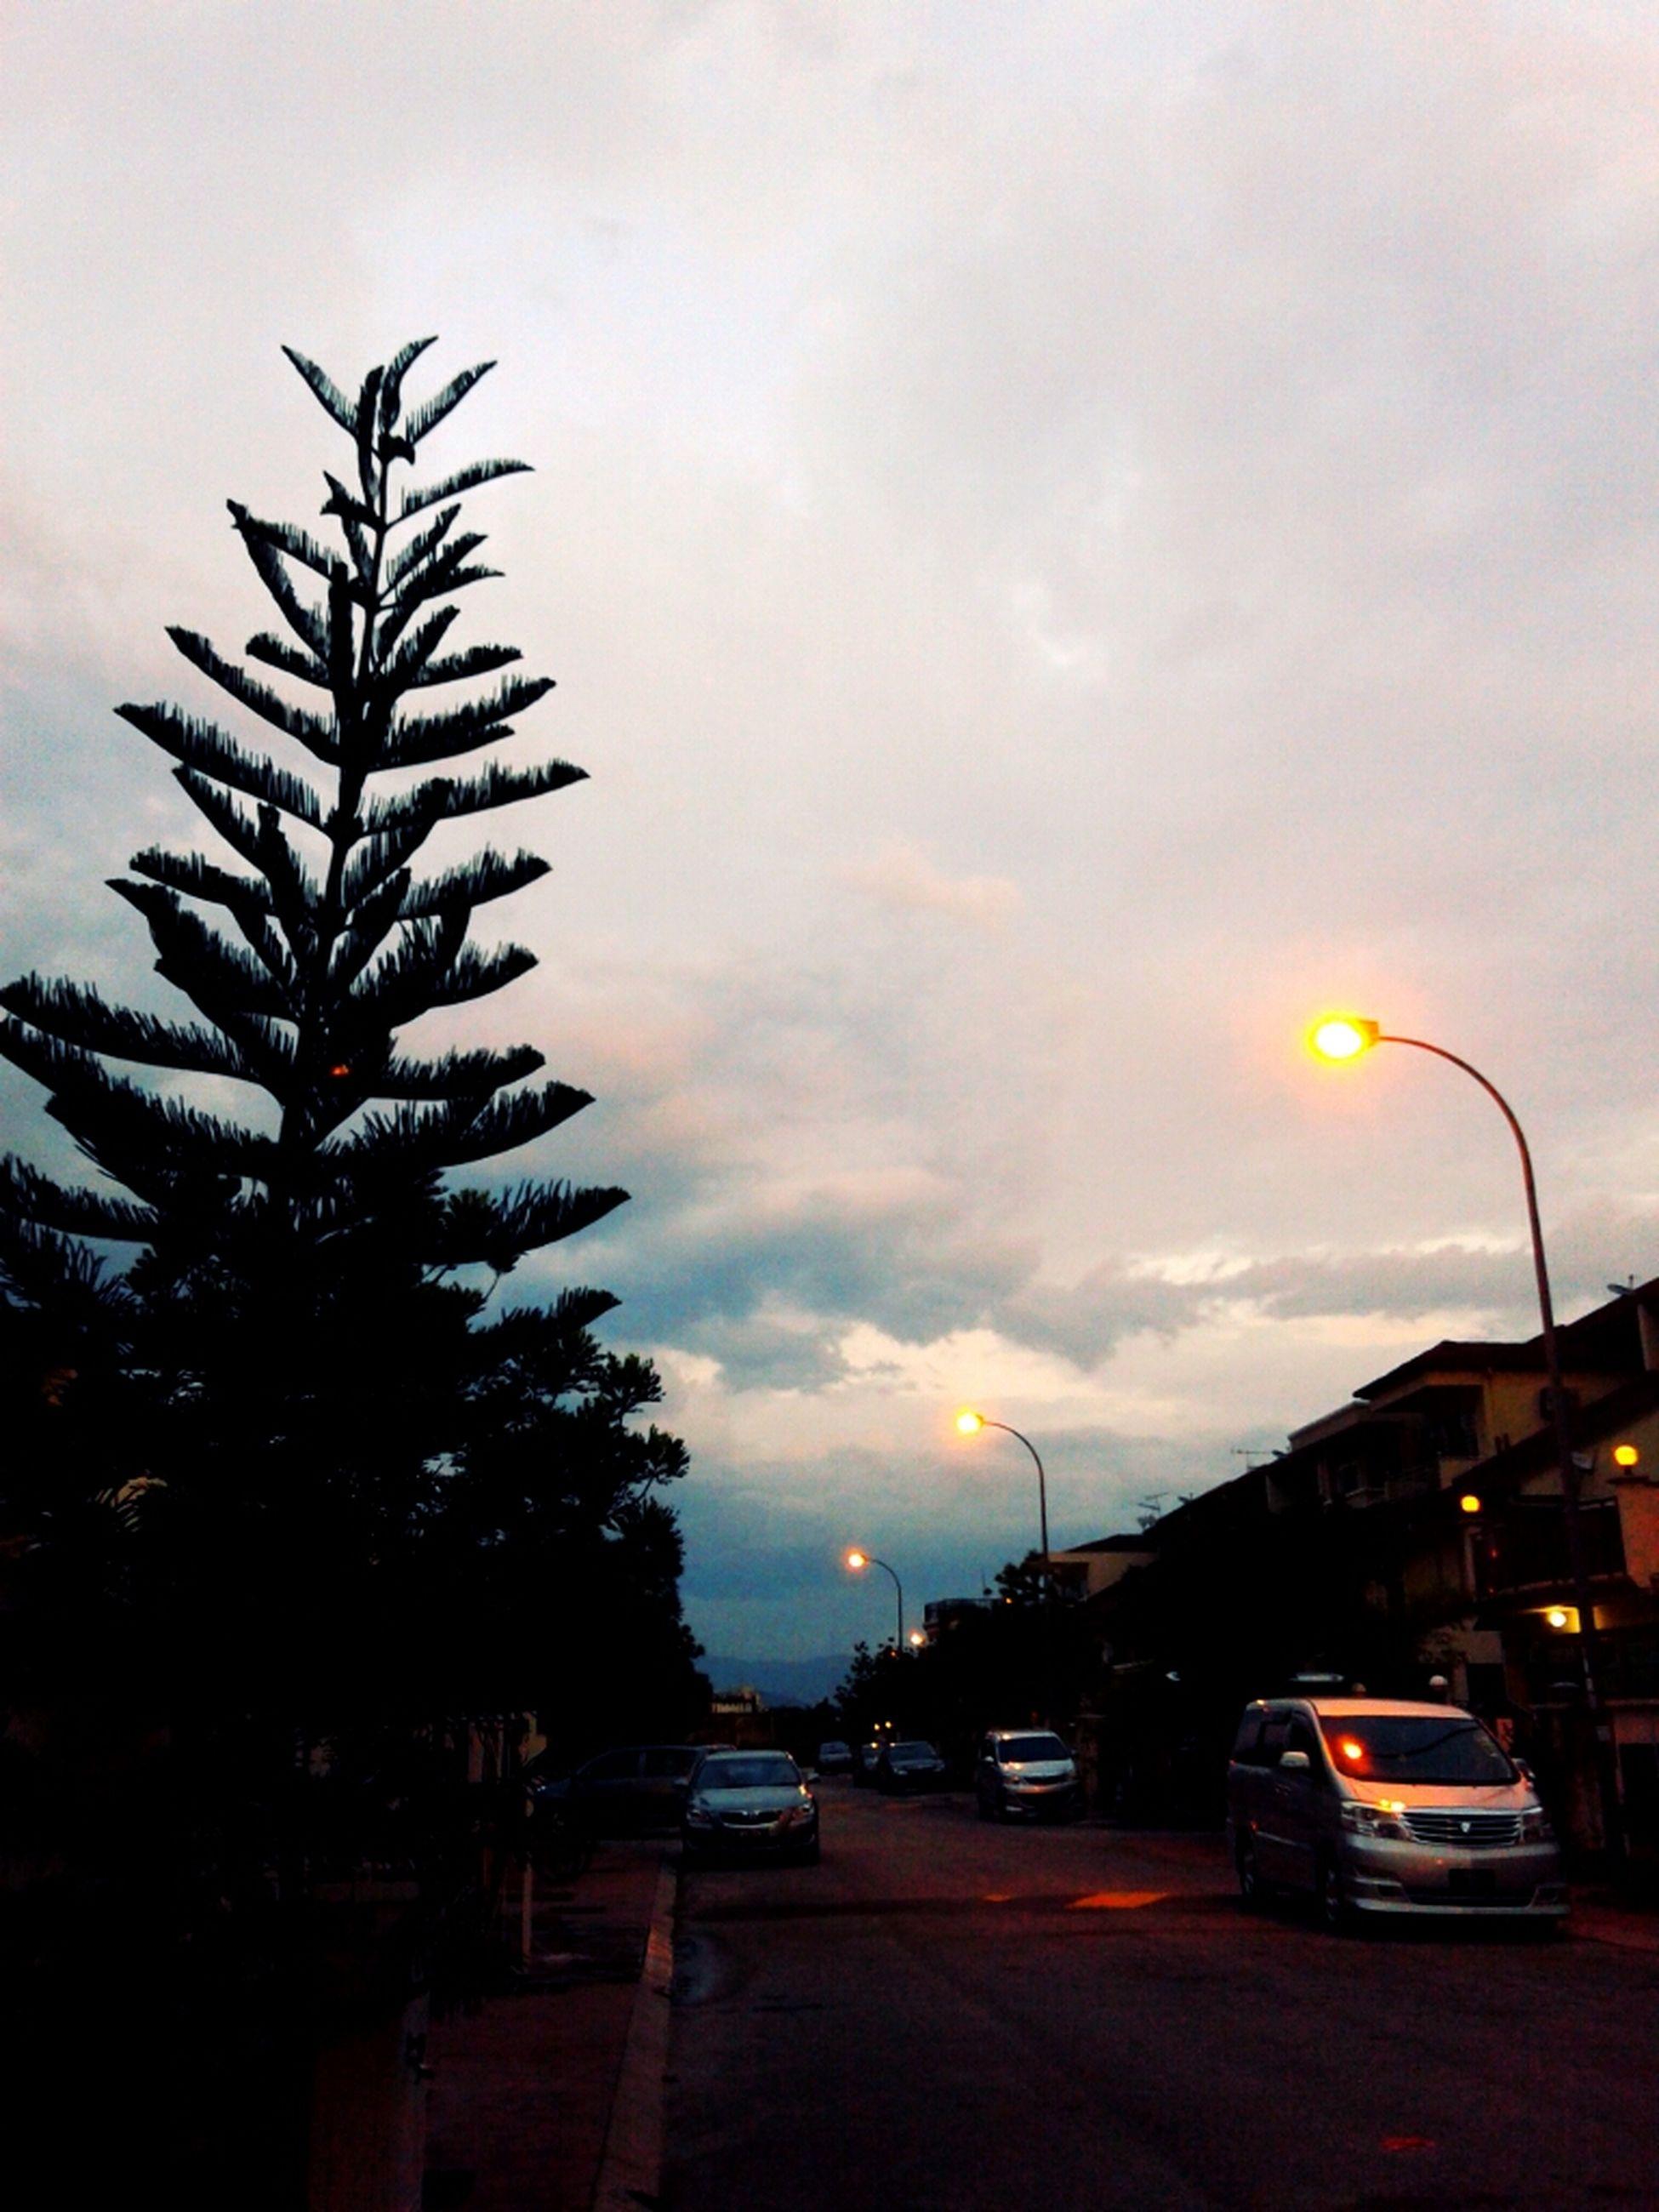 car, transportation, land vehicle, sky, road, mode of transport, street, street light, cloud - sky, building exterior, architecture, built structure, tree, sunset, illuminated, traffic, city, dusk, cloudy, cloud